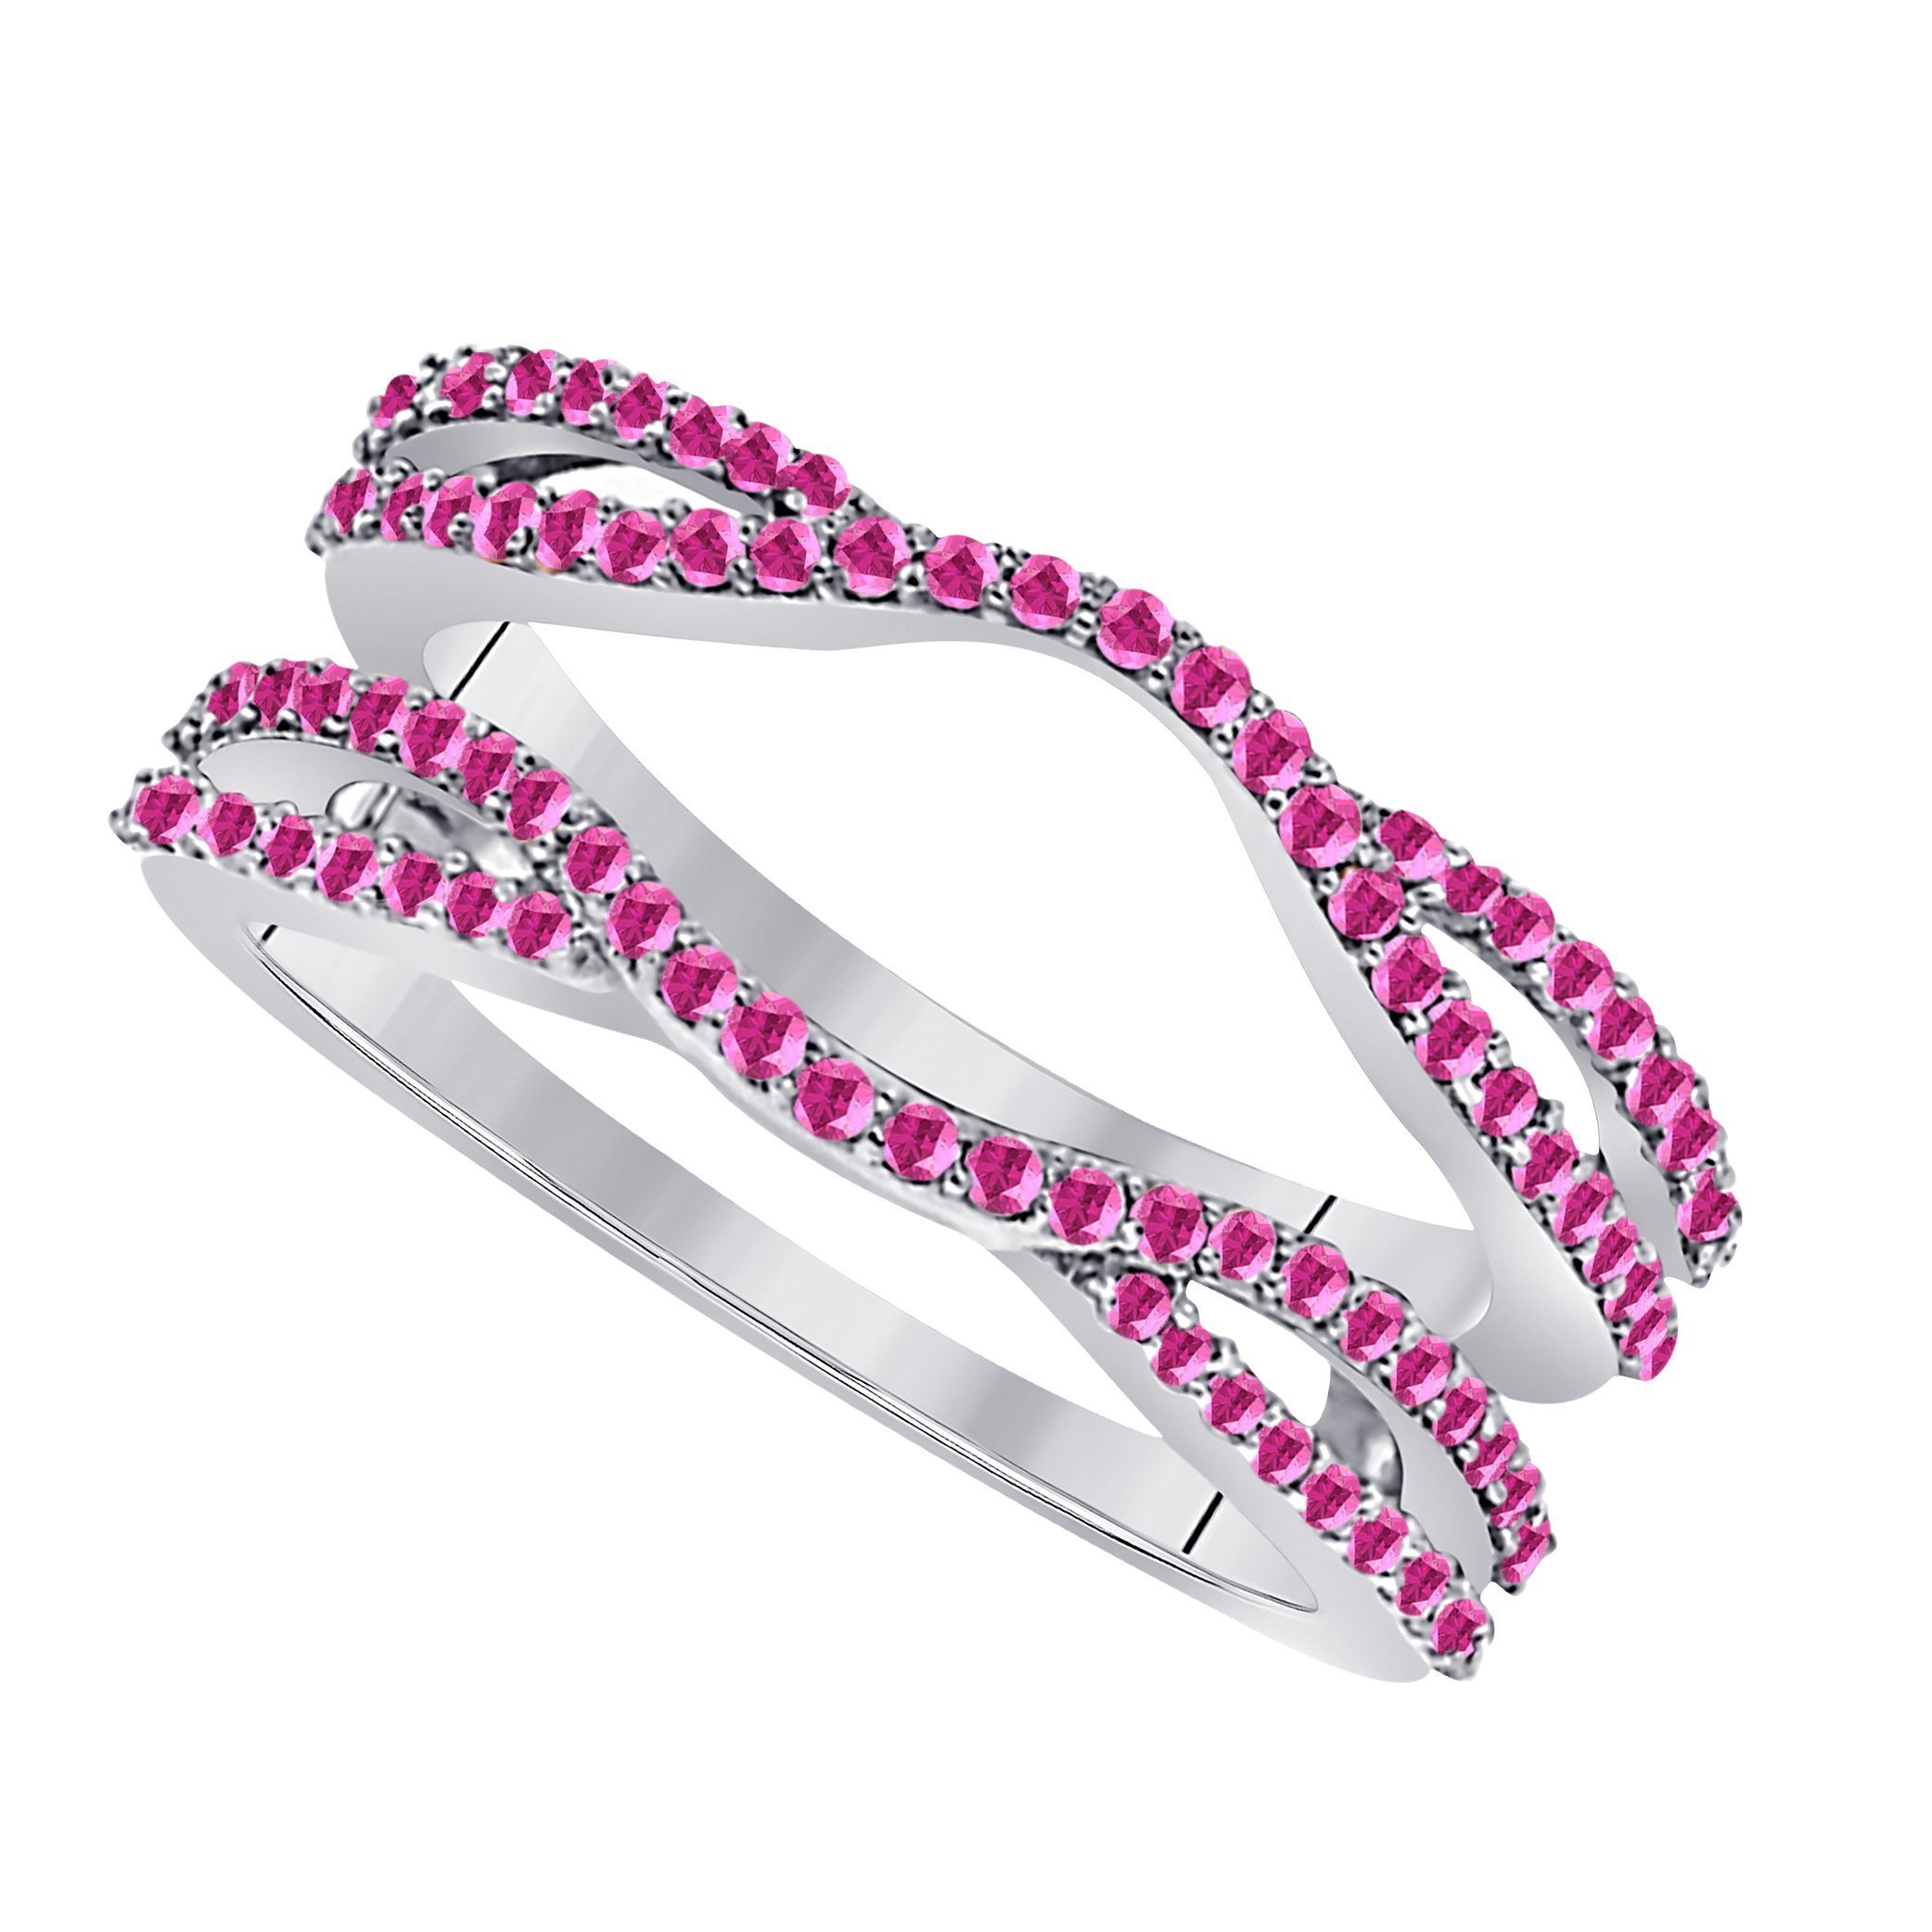 Star Retail 1/2 Ct 14K White Gold Finish Round Cut Lab Created Pink Sapphire Ladies Anniversary Wedding Band Enhancer Guard Double Chevron Ring